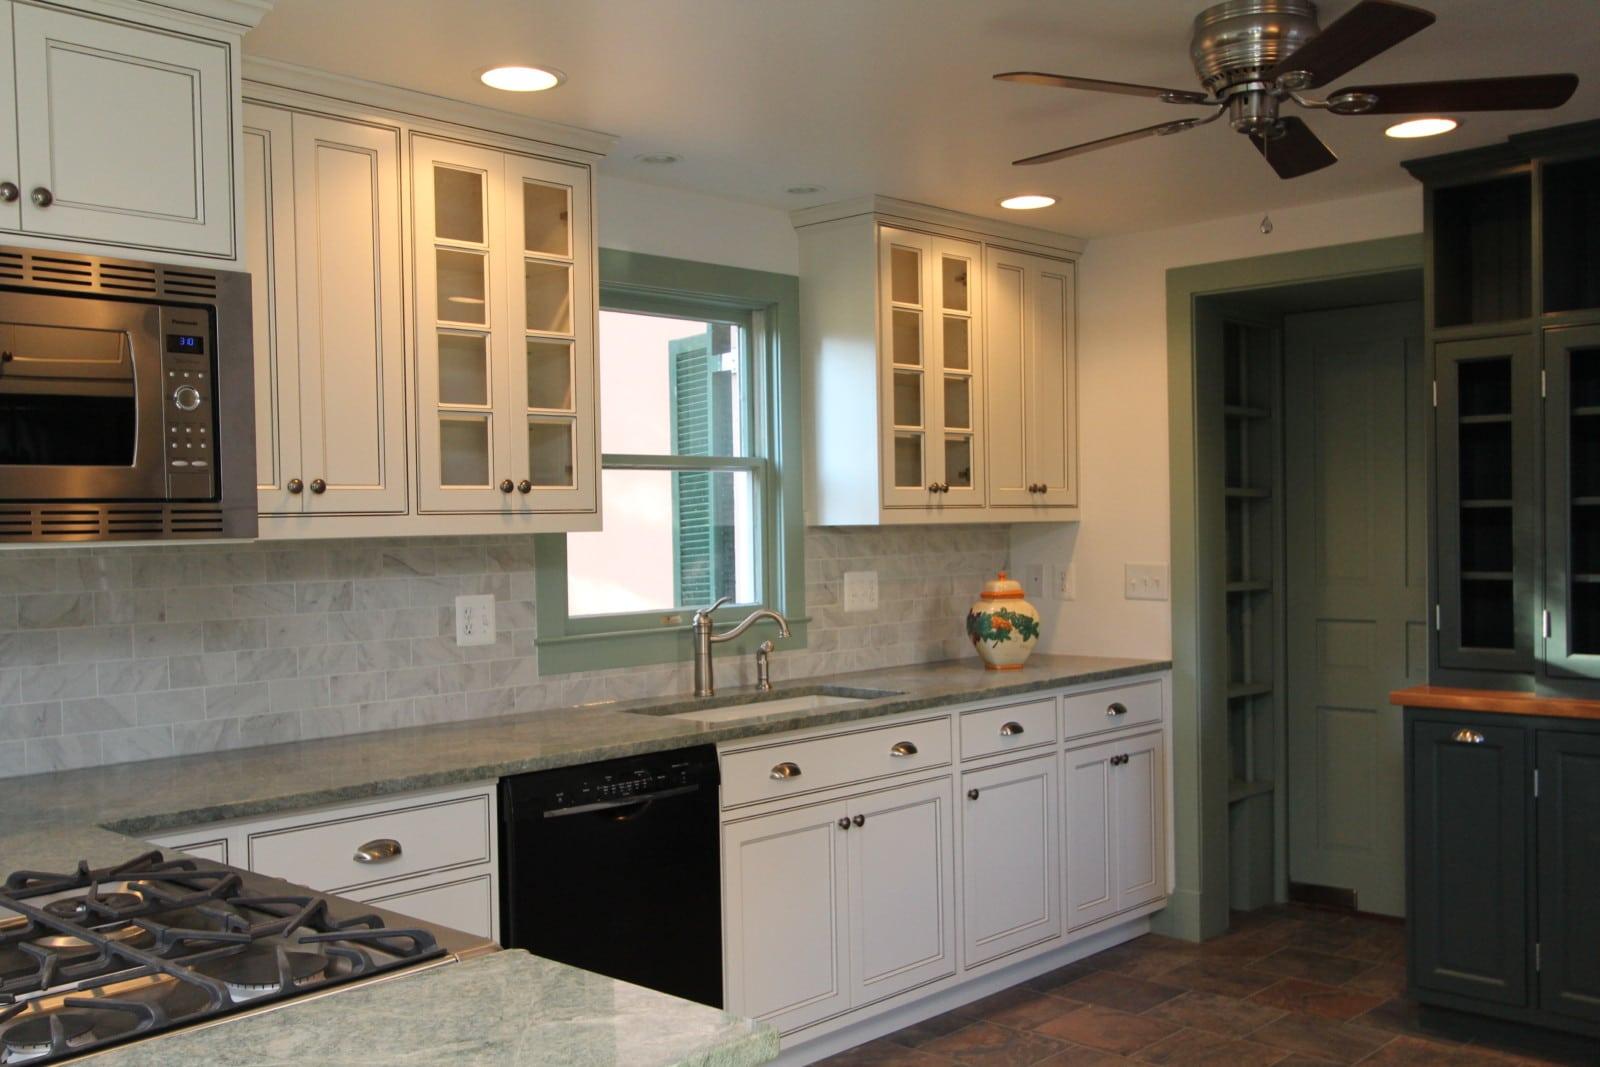 Custom Kitchen Cabinetry,kitchen Renovation Contractor,kitchen Design  Service,kitchen Renovation,small ...